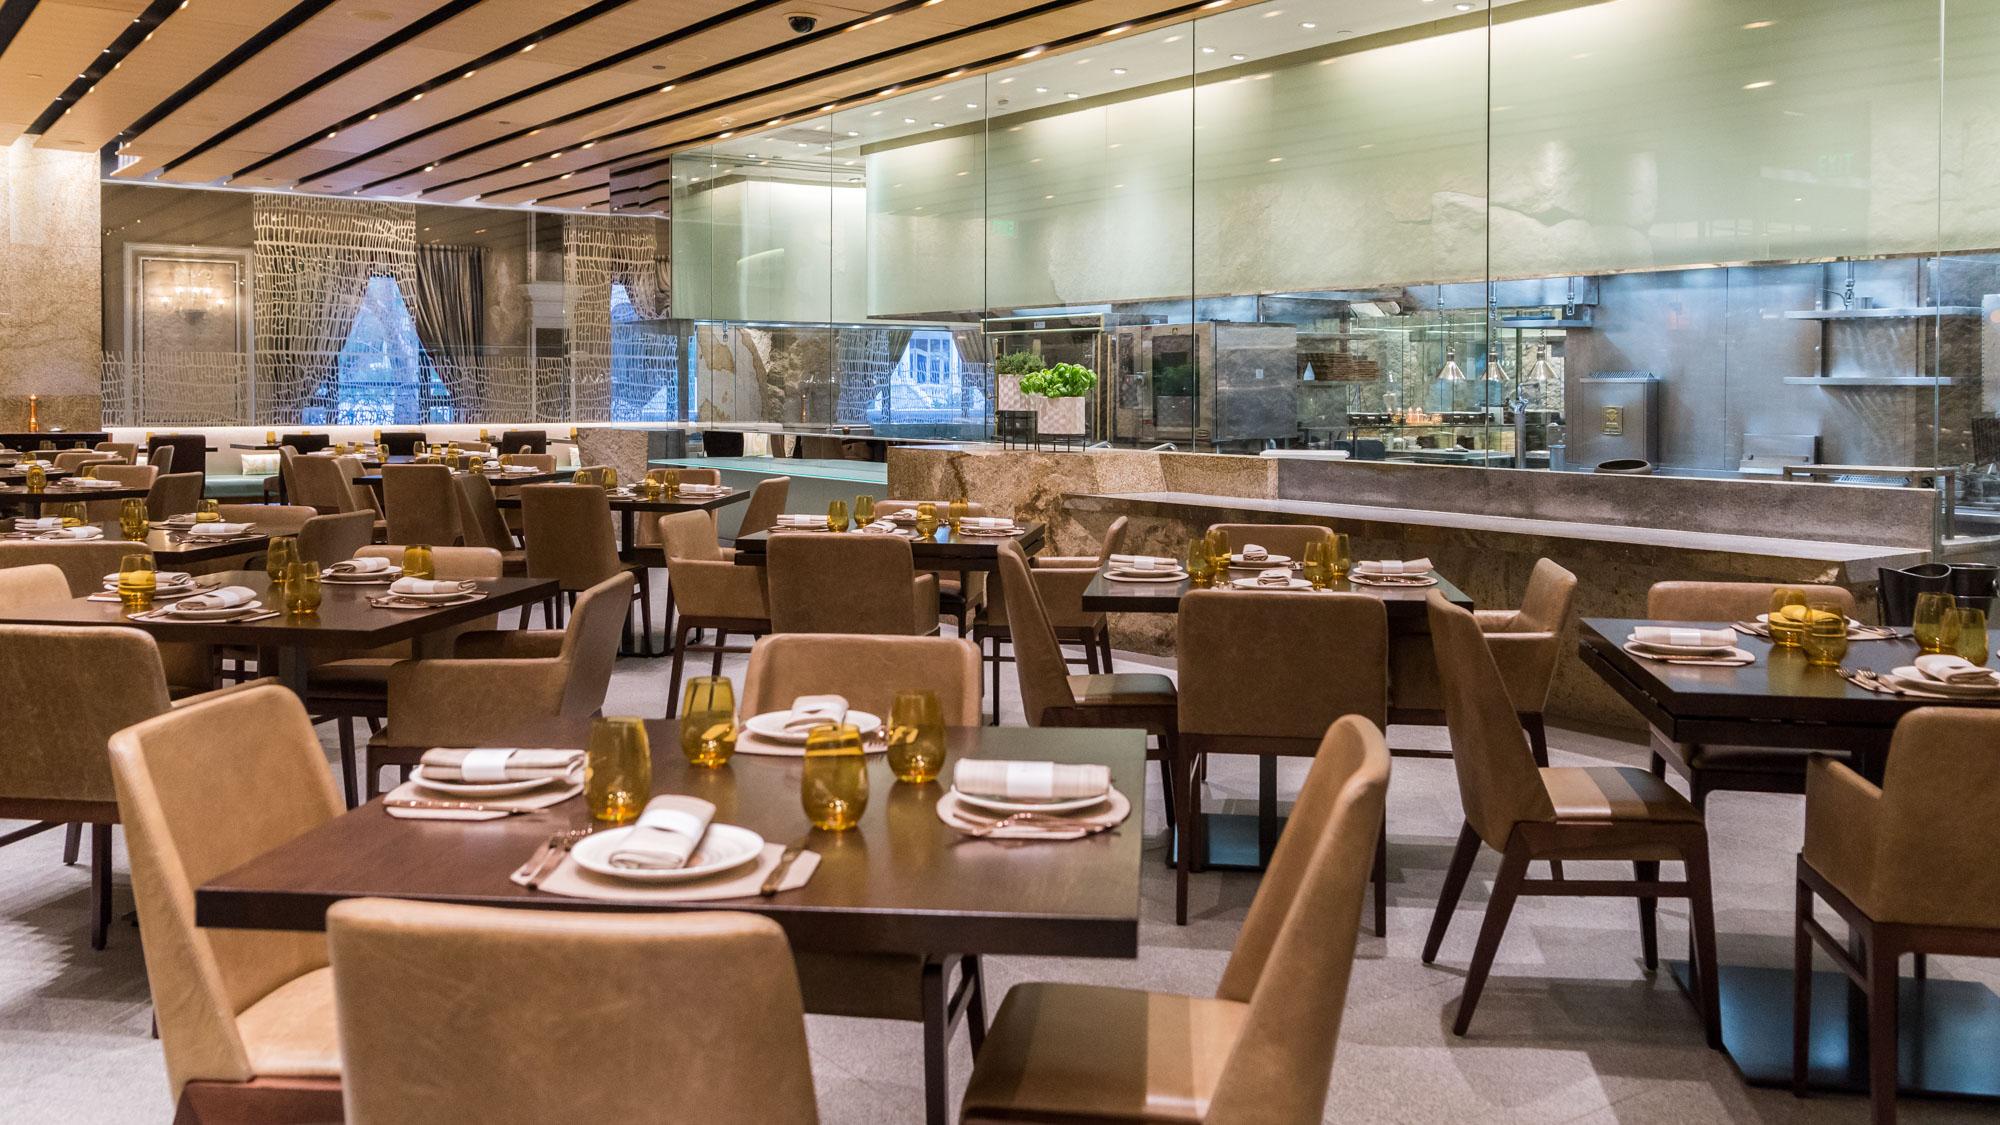 Peer Inside Harvest Roy Ellamars New Restaurant At The Bellagio